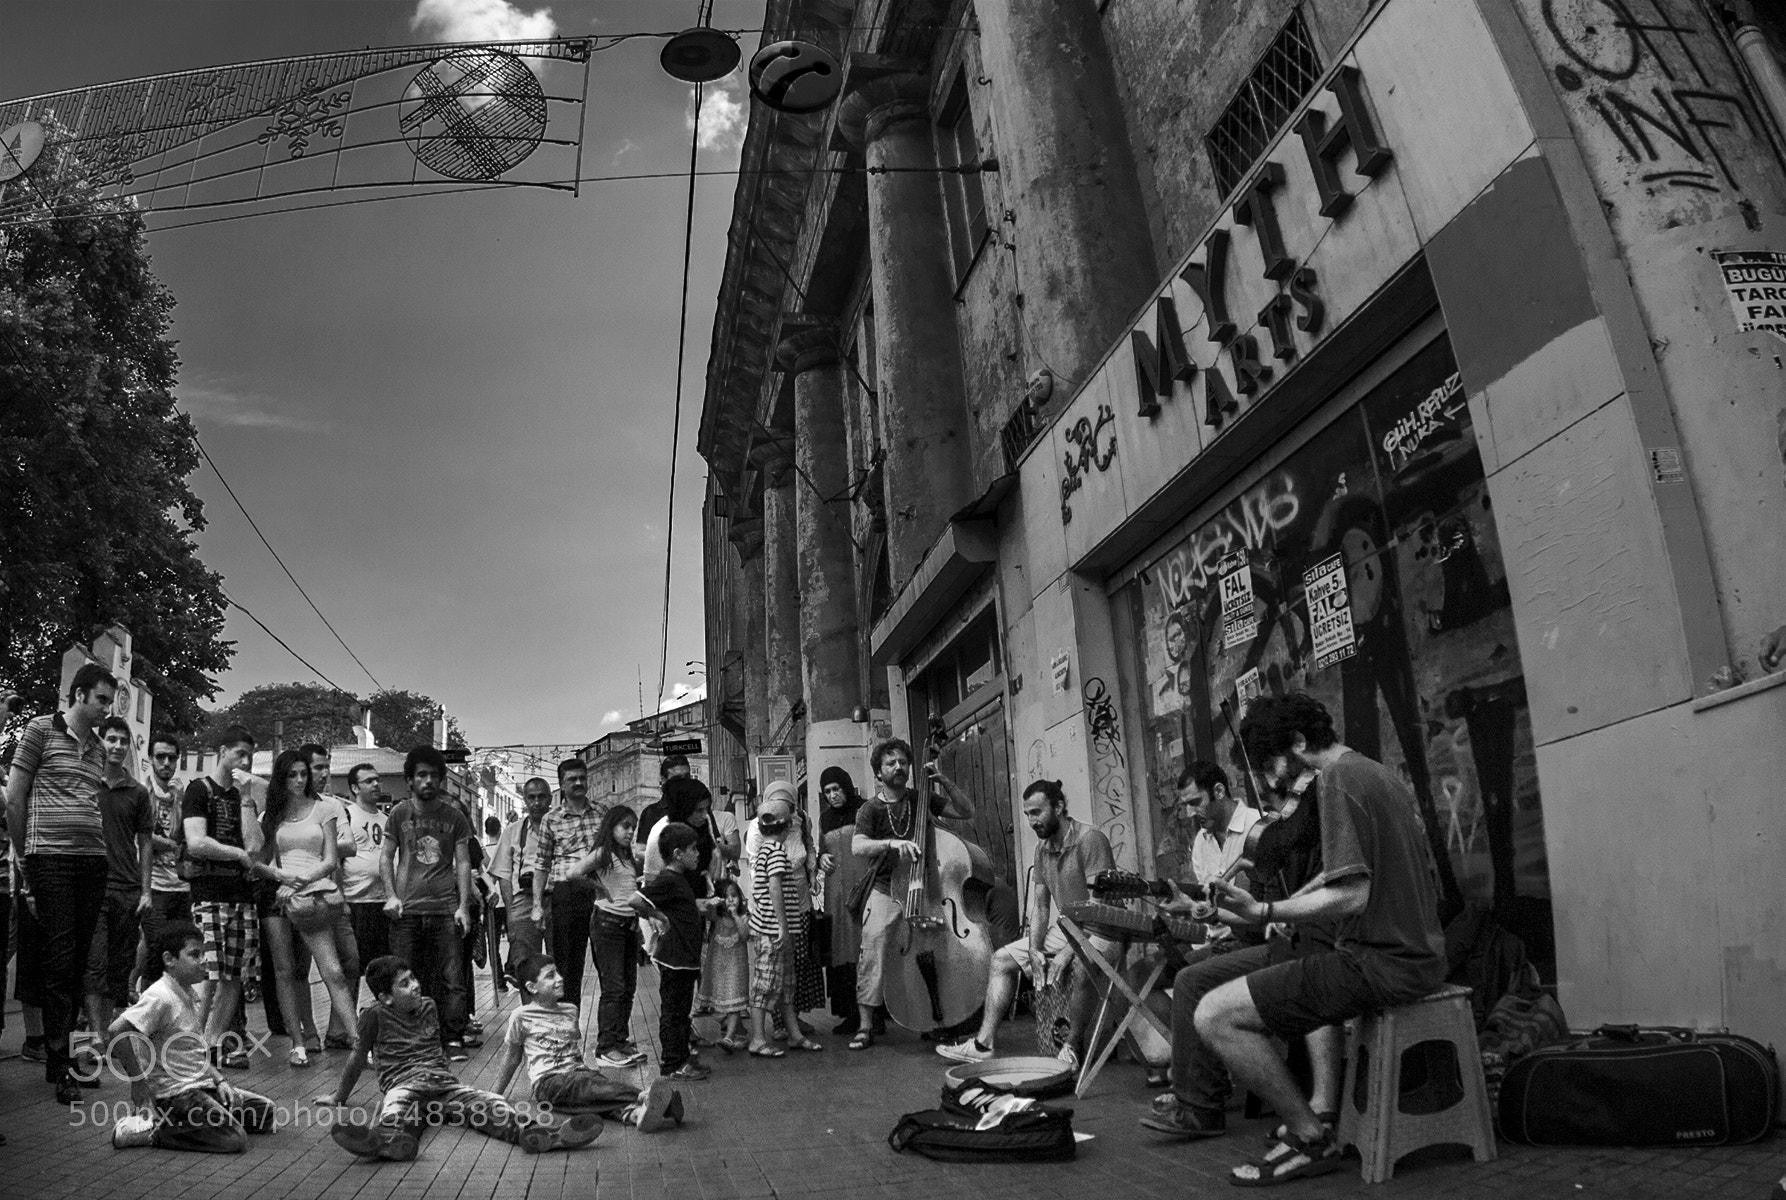 Photograph Myth by Seyhan Gungor on 500px